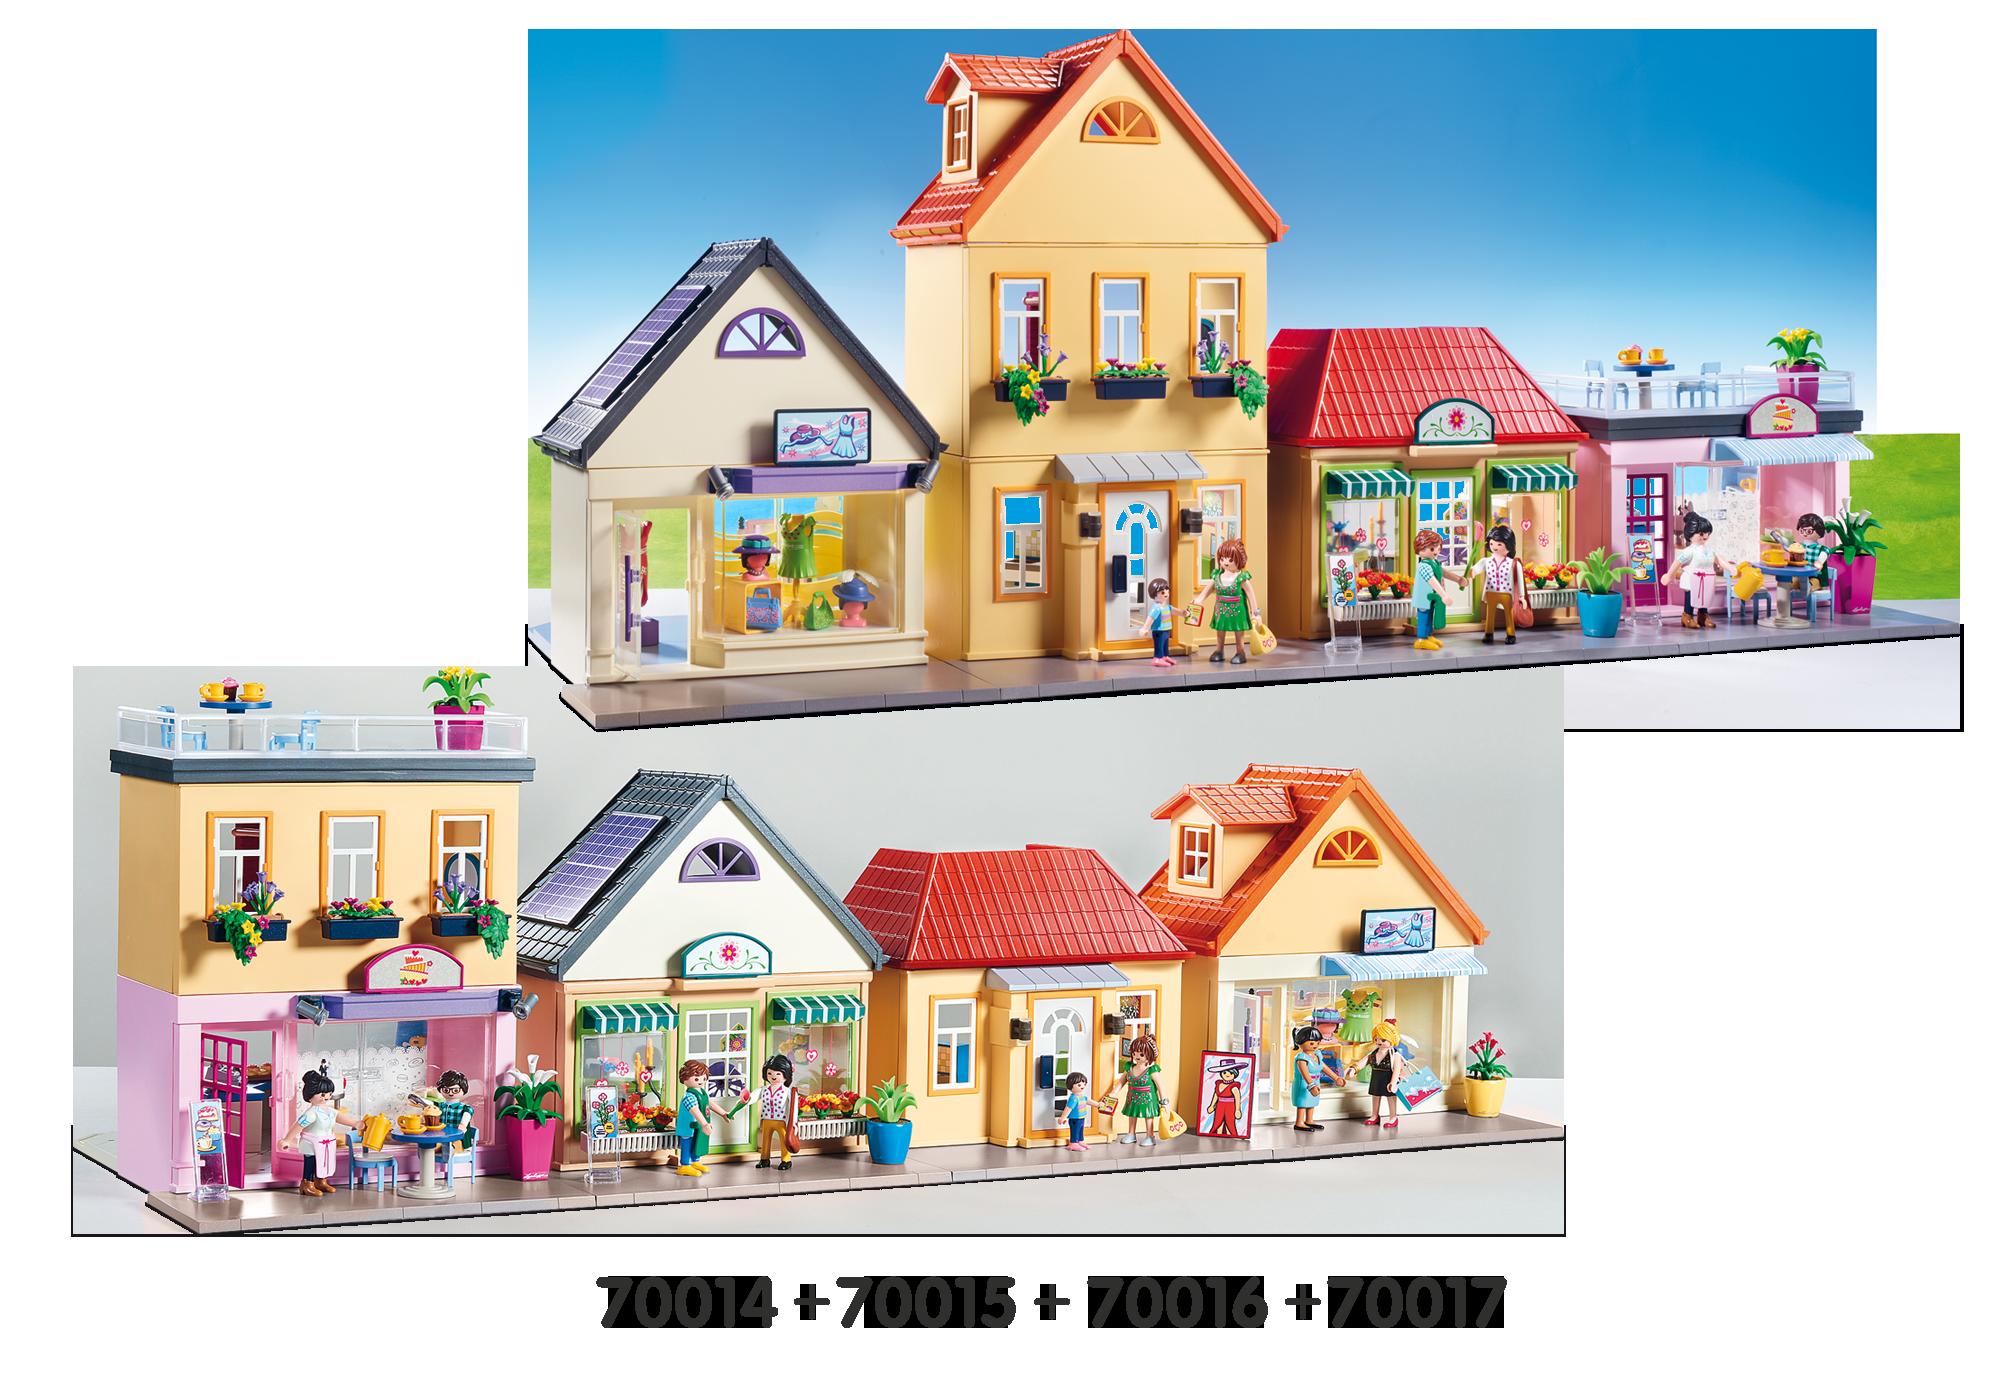 http://media.playmobil.com/i/playmobil/70014_product_extra4/Mein Stadthaus